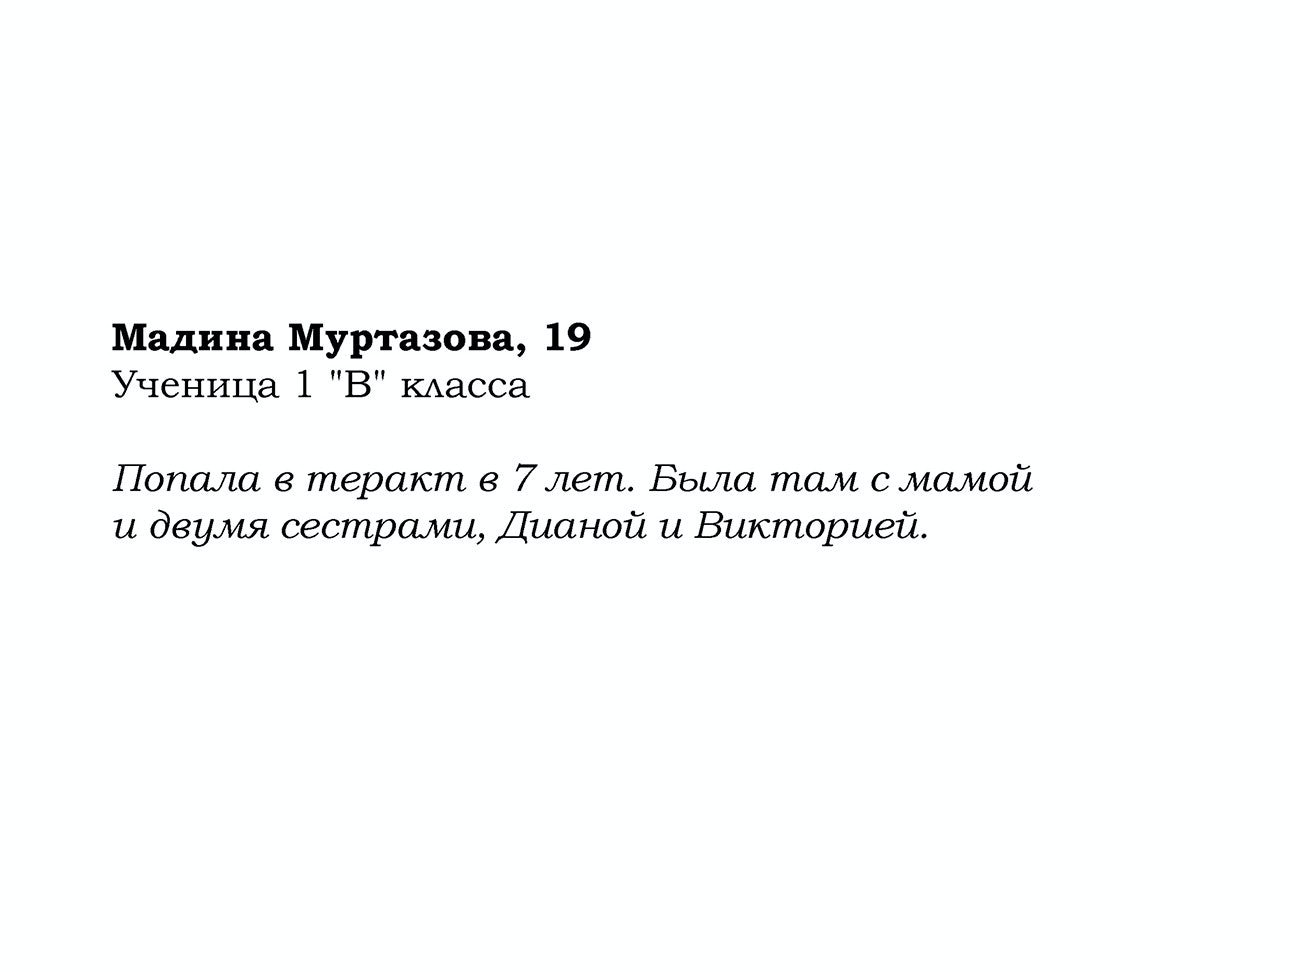 beslan_19